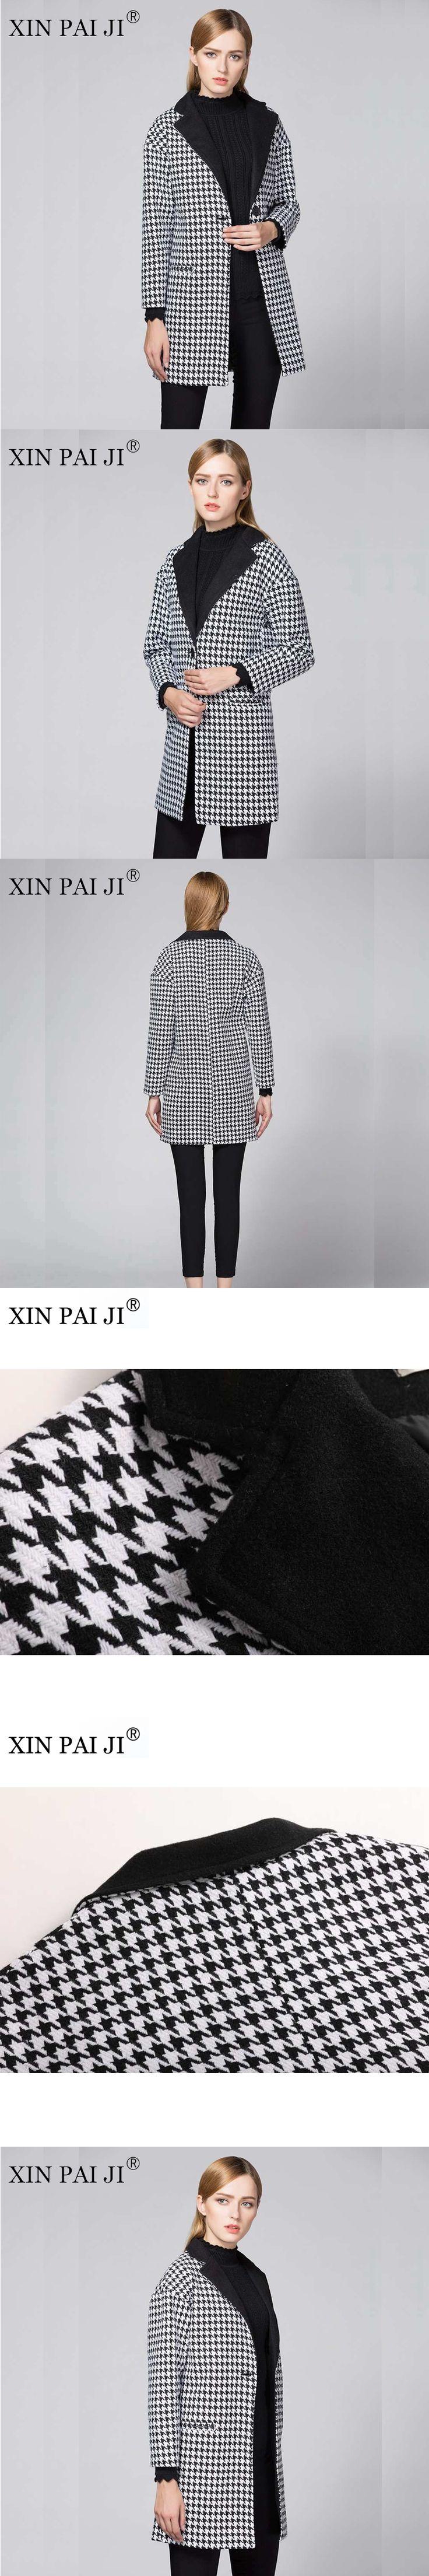 XIN PAI JI  2017 New Women Wool Long Coat Full Sleeve Autumn Winter Houndstooth Pockets Single Button Turn-down Collar Coat